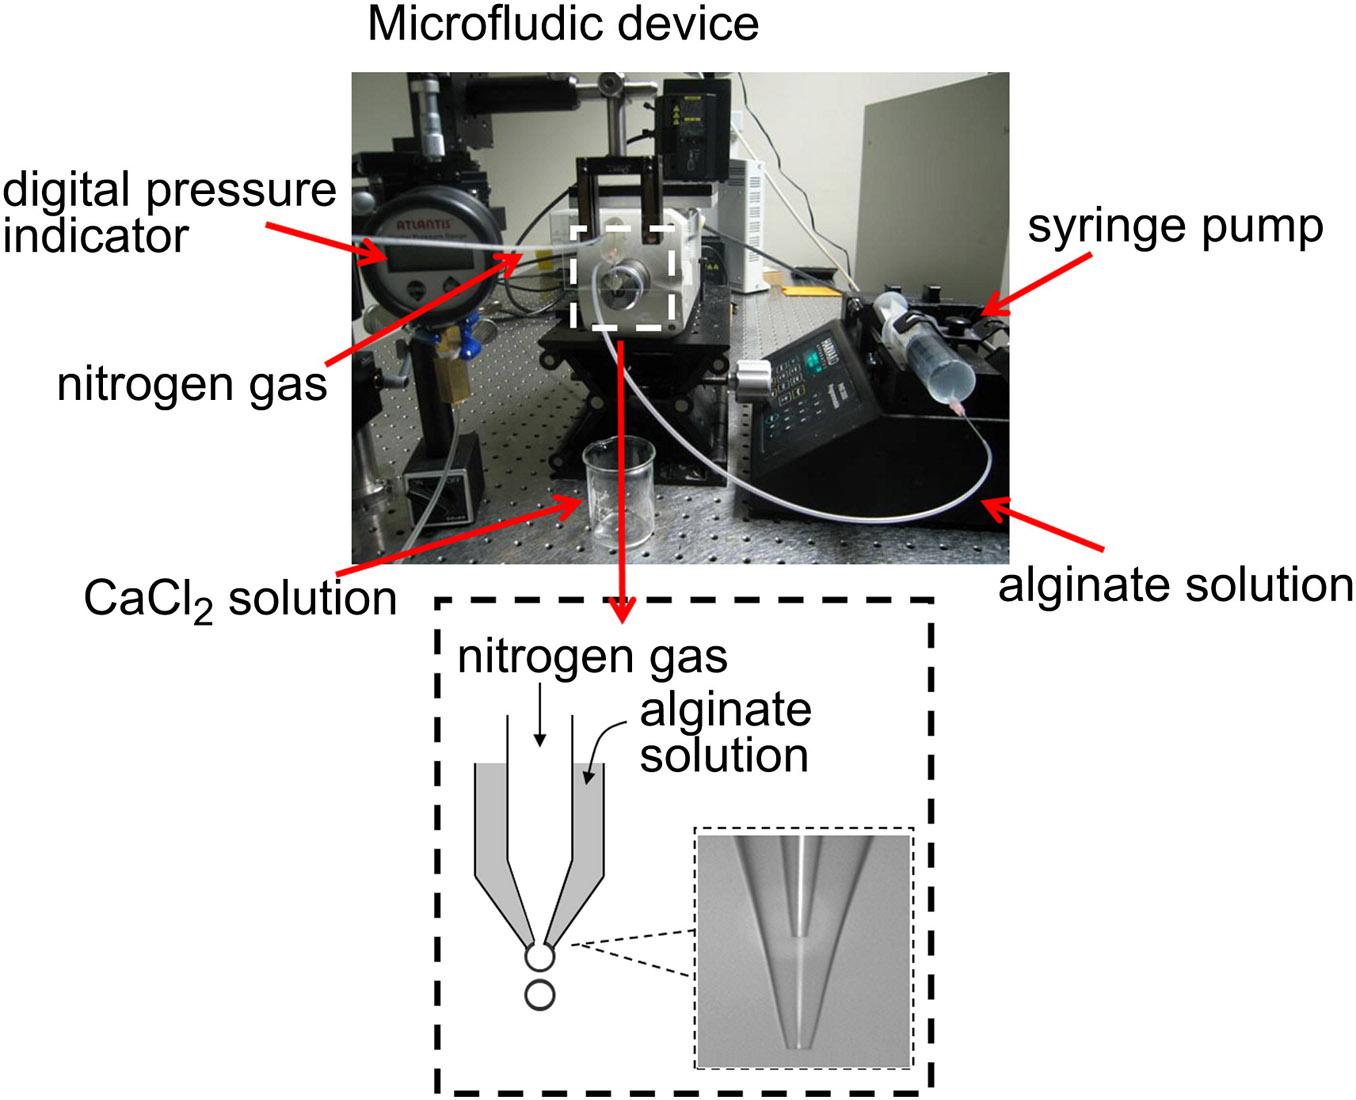 Scaffold_Microfluidic_Setup.jpg